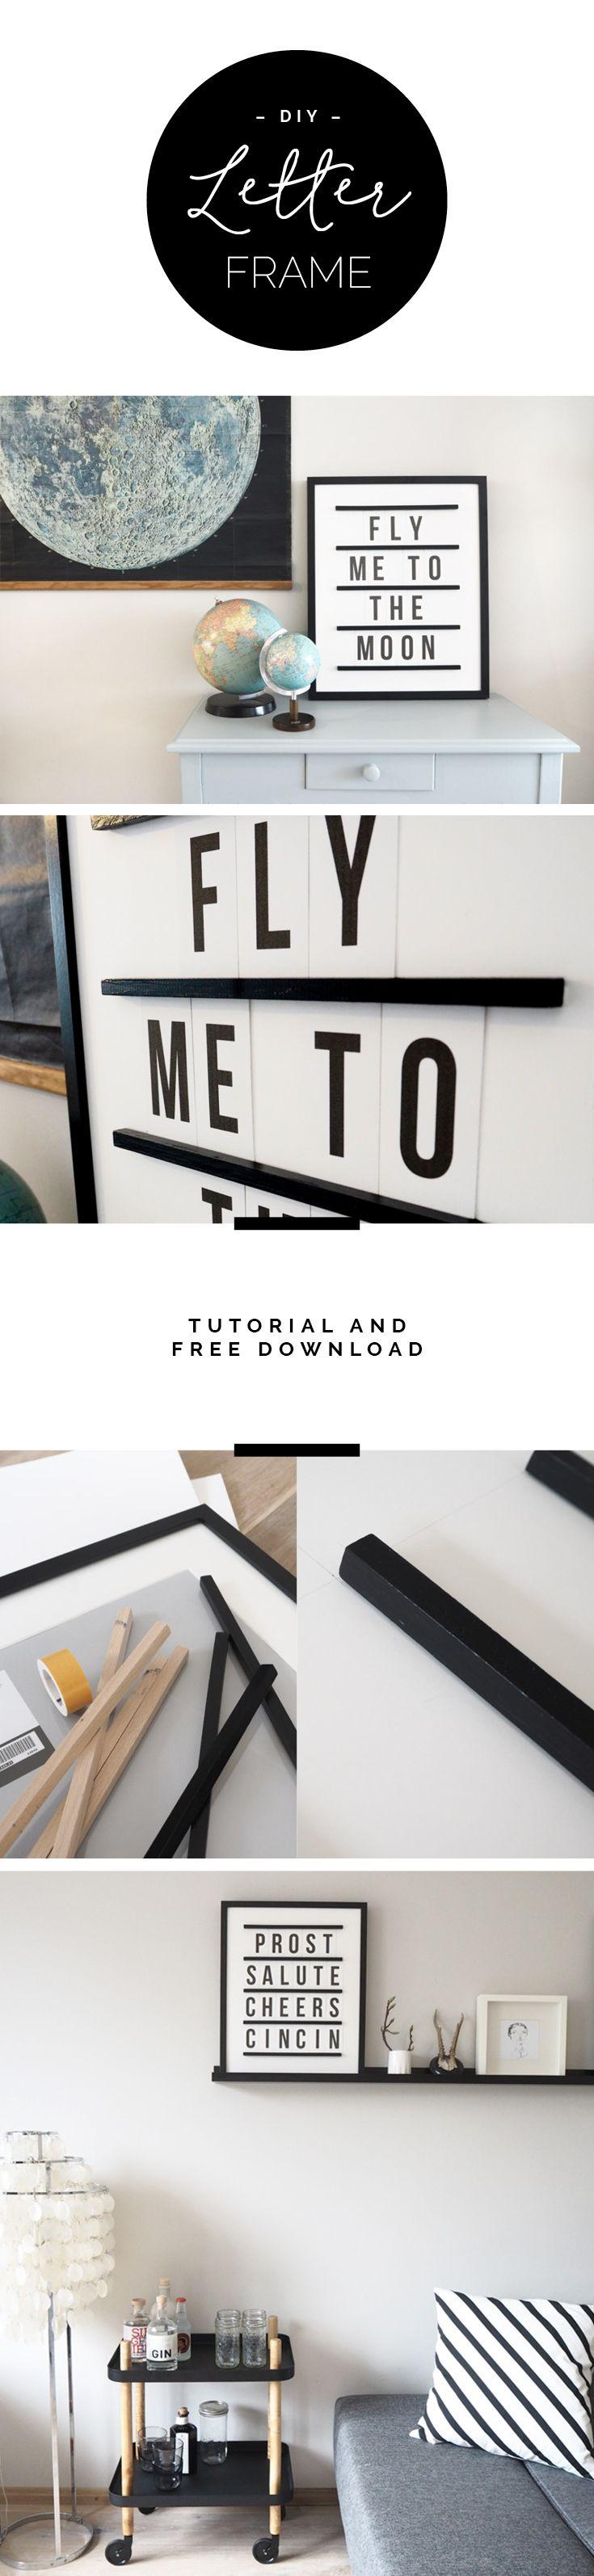 Letter Frame DIY | sodapop design